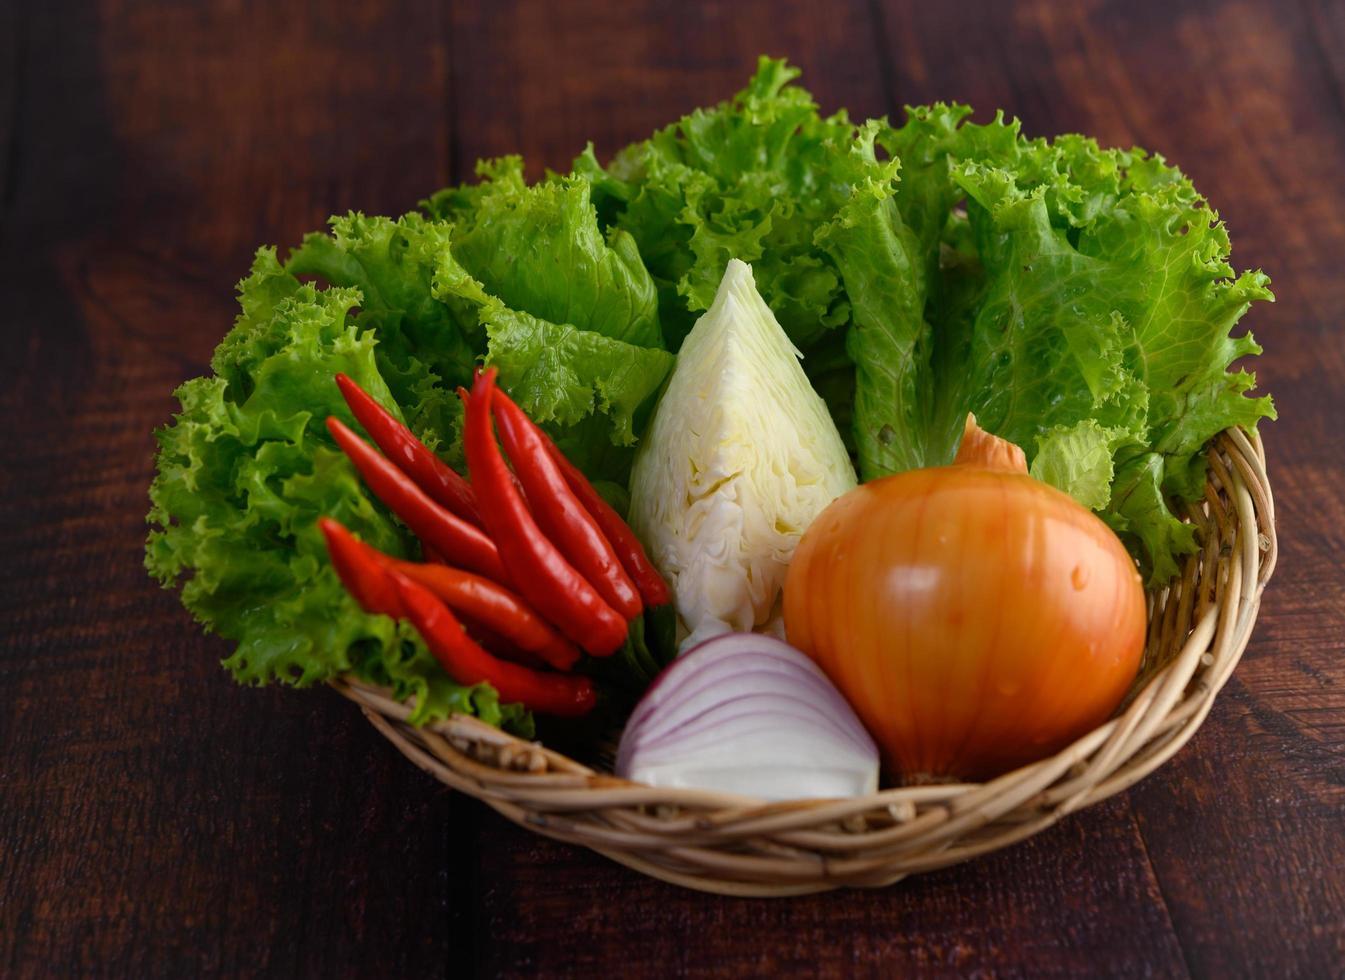 verdure in un cesto di vimini foto